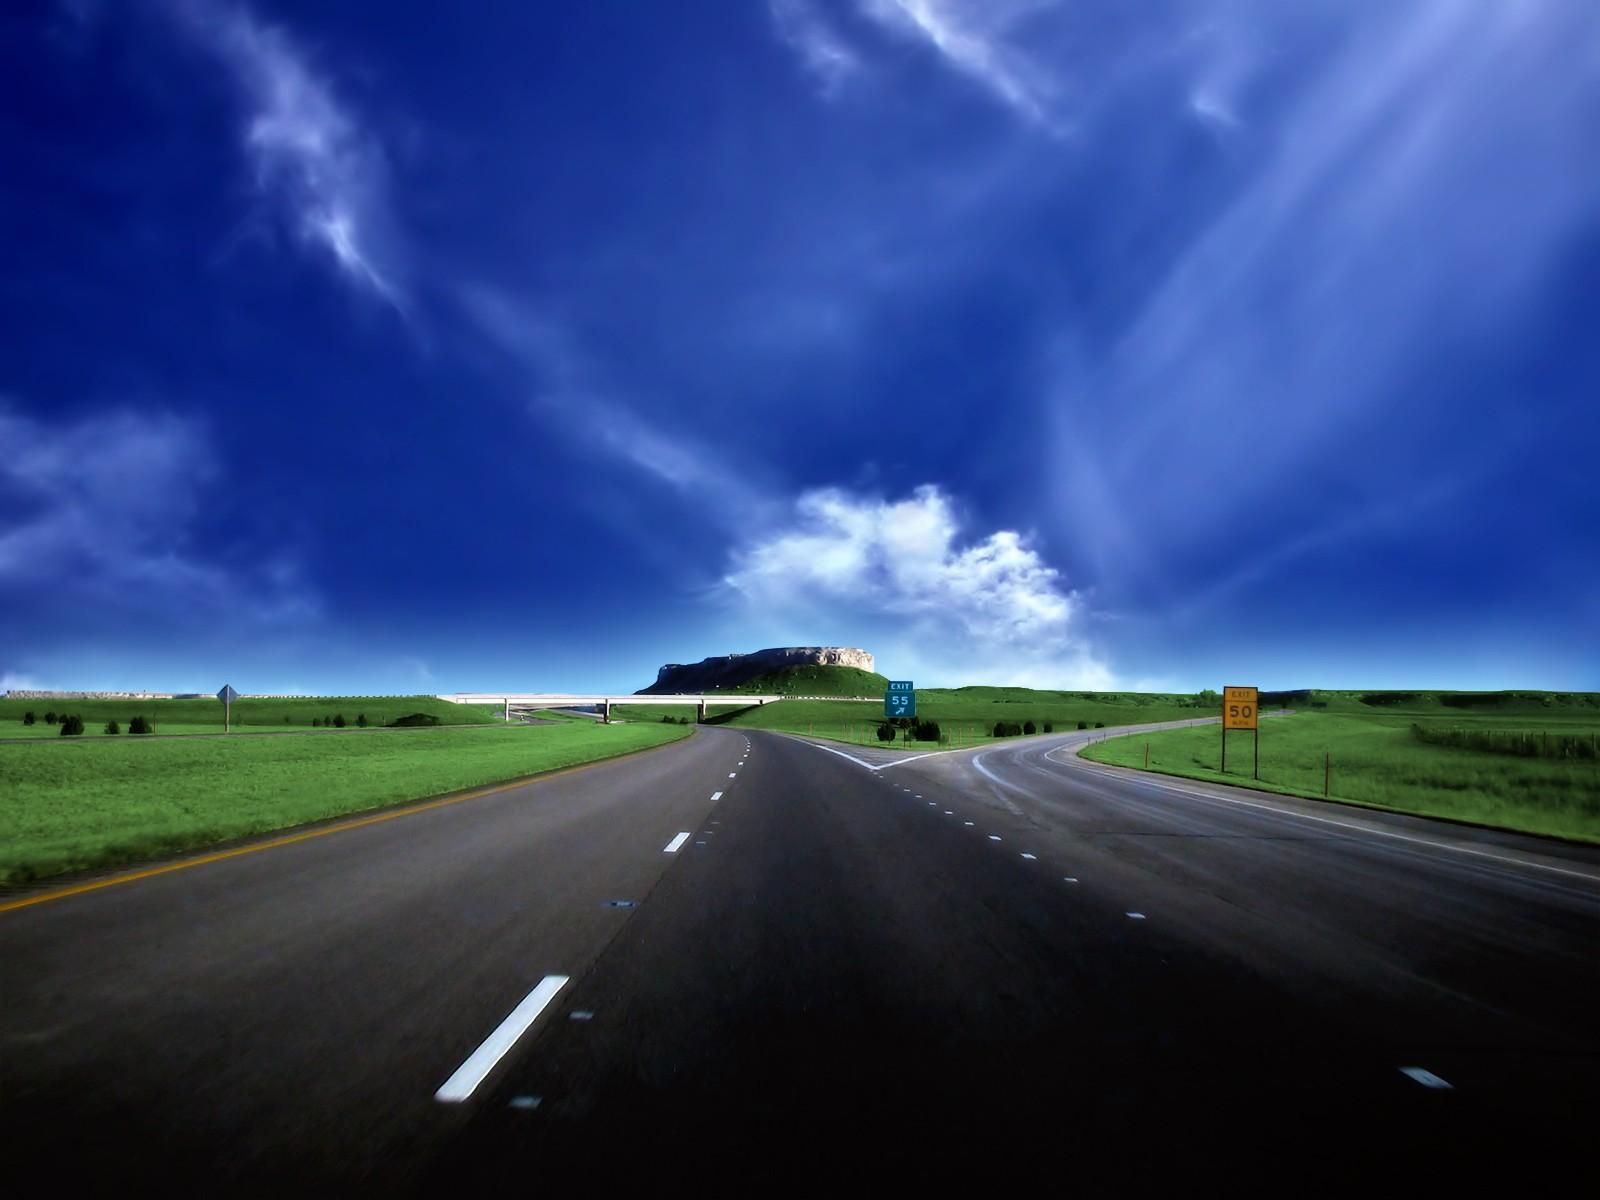 ведутся перекресток трех дорог фото услуги уточняйте менеджера